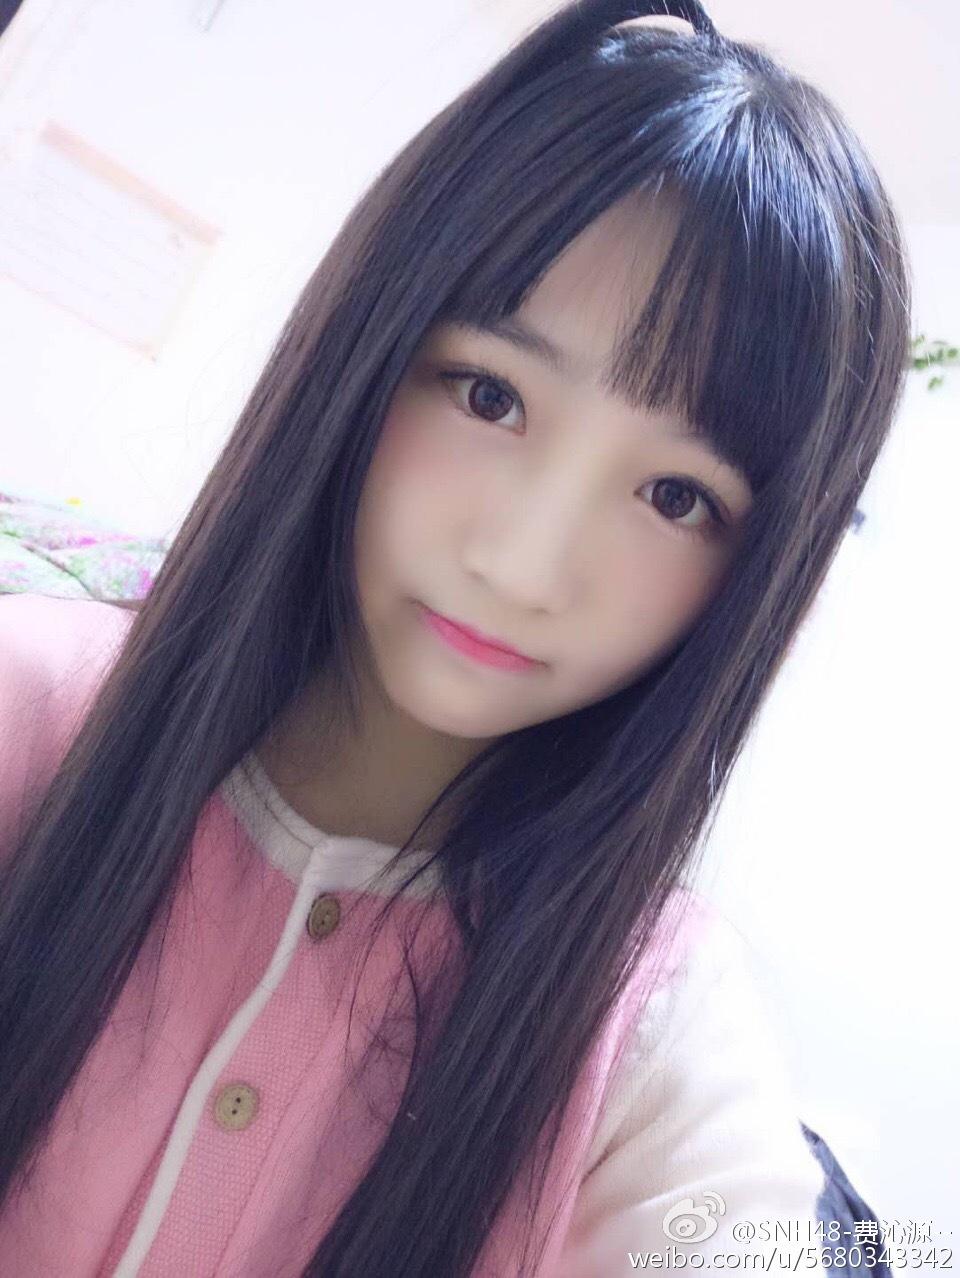 エロ 動画 少女 美